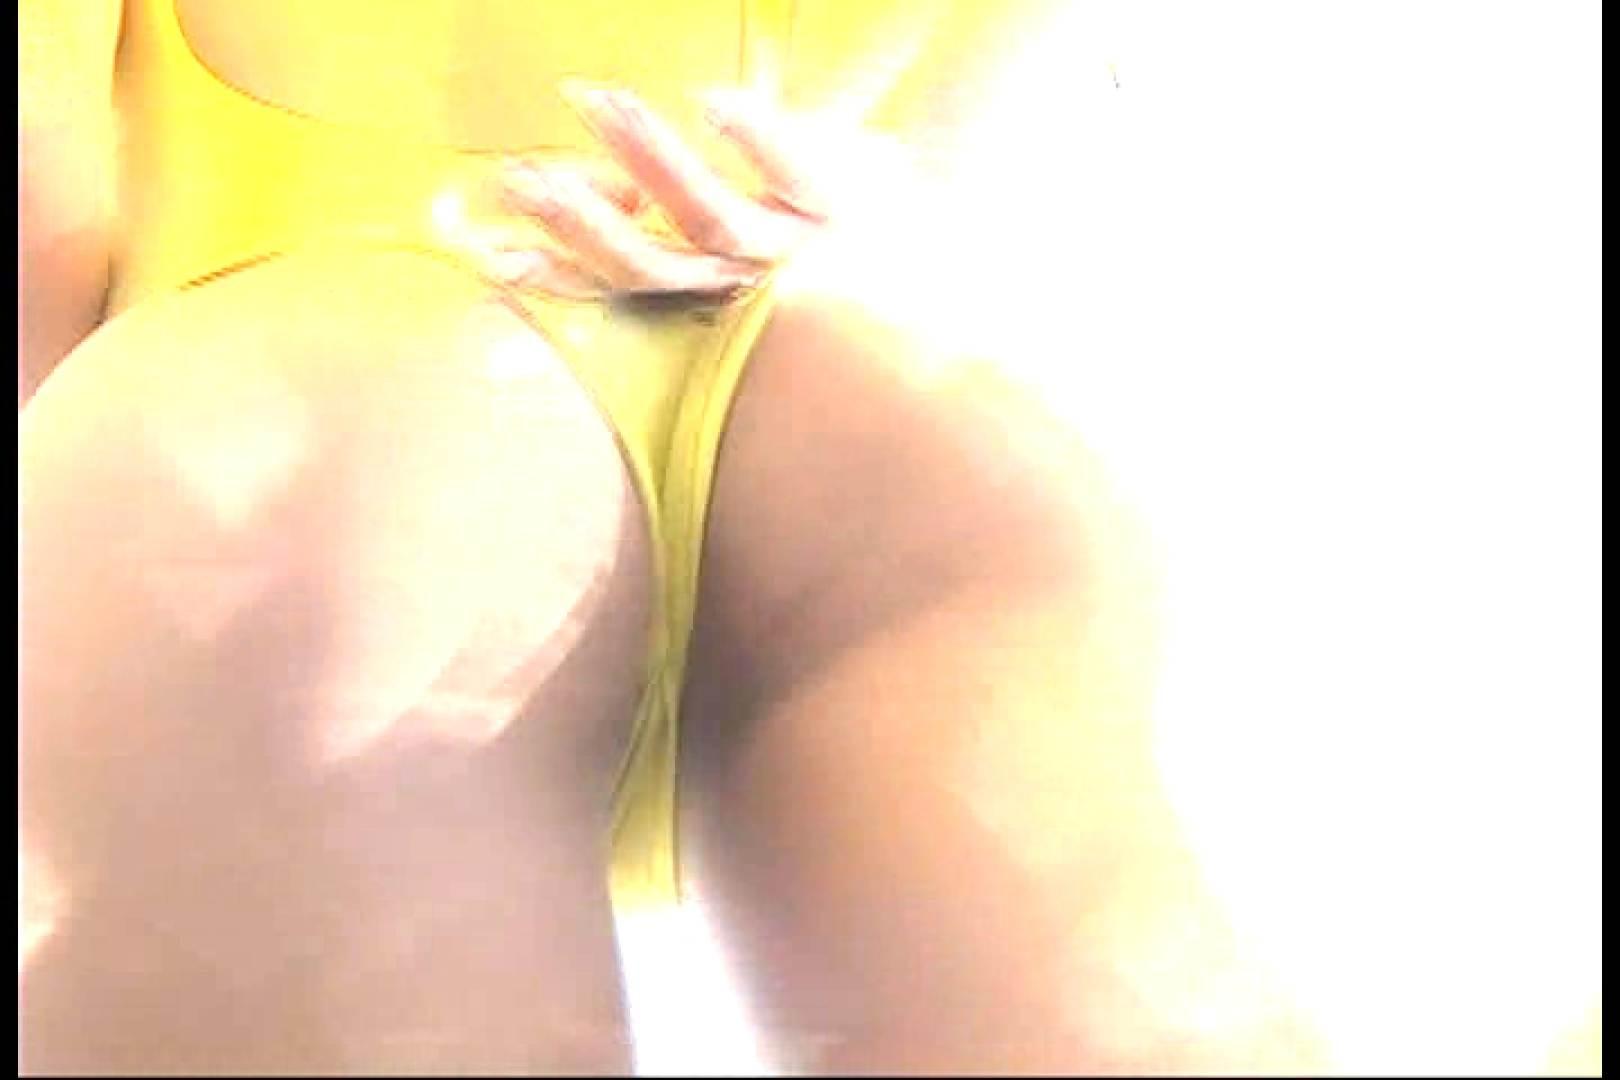 RQカメラ地獄Vol.8 コスチューム  69枚 68